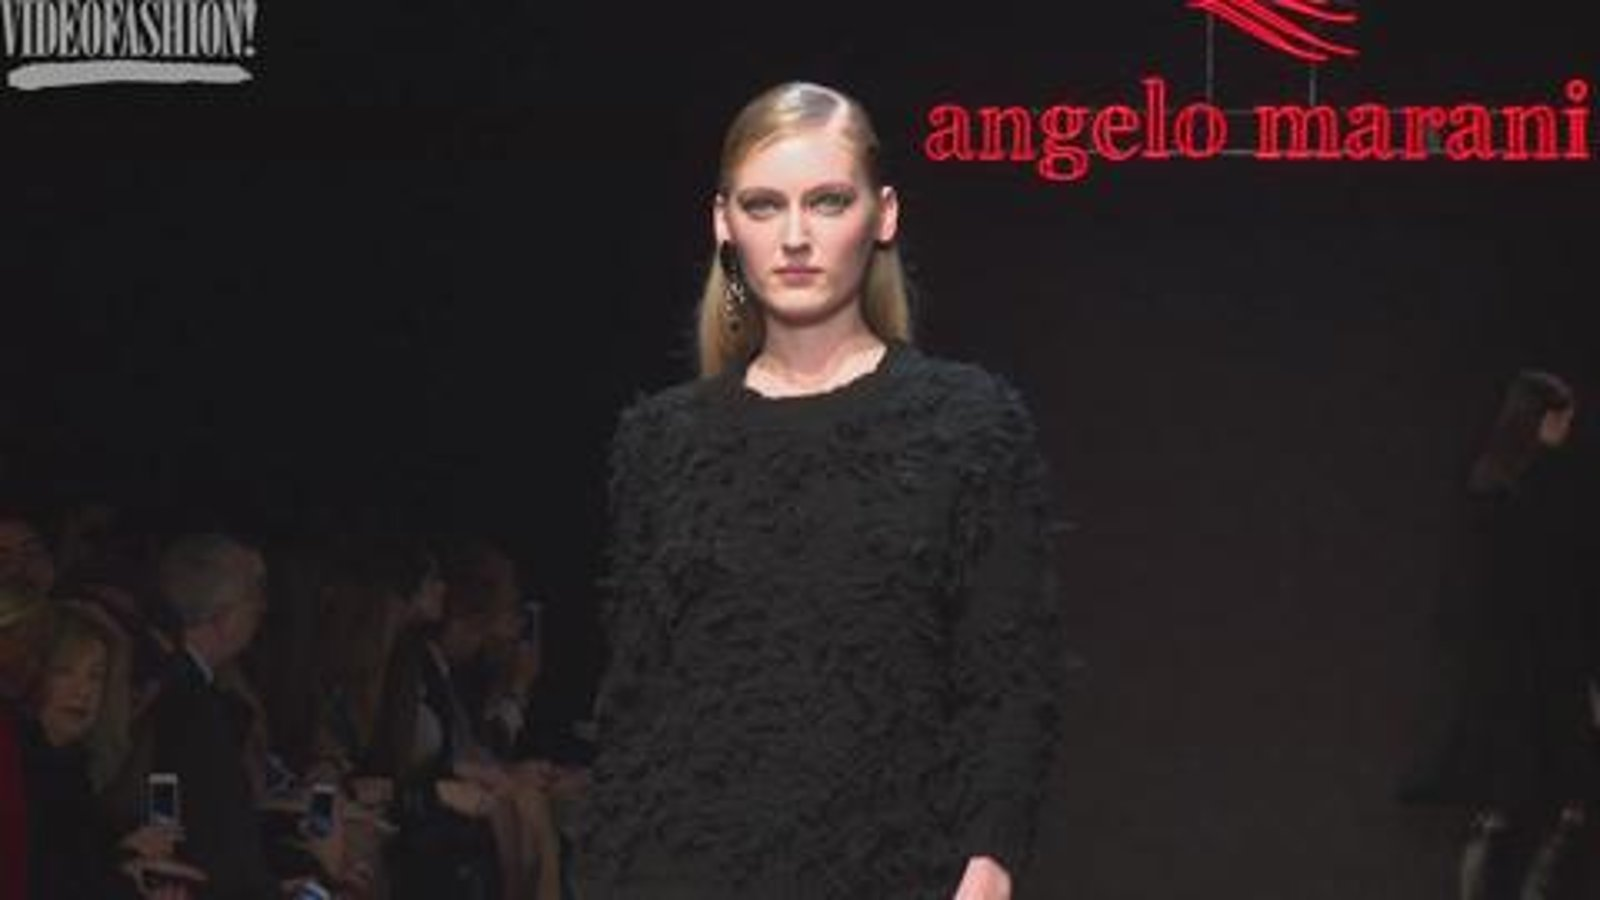 Fausto Puglisi, Angelo Marani and Anteprima - Milan Fall 2015